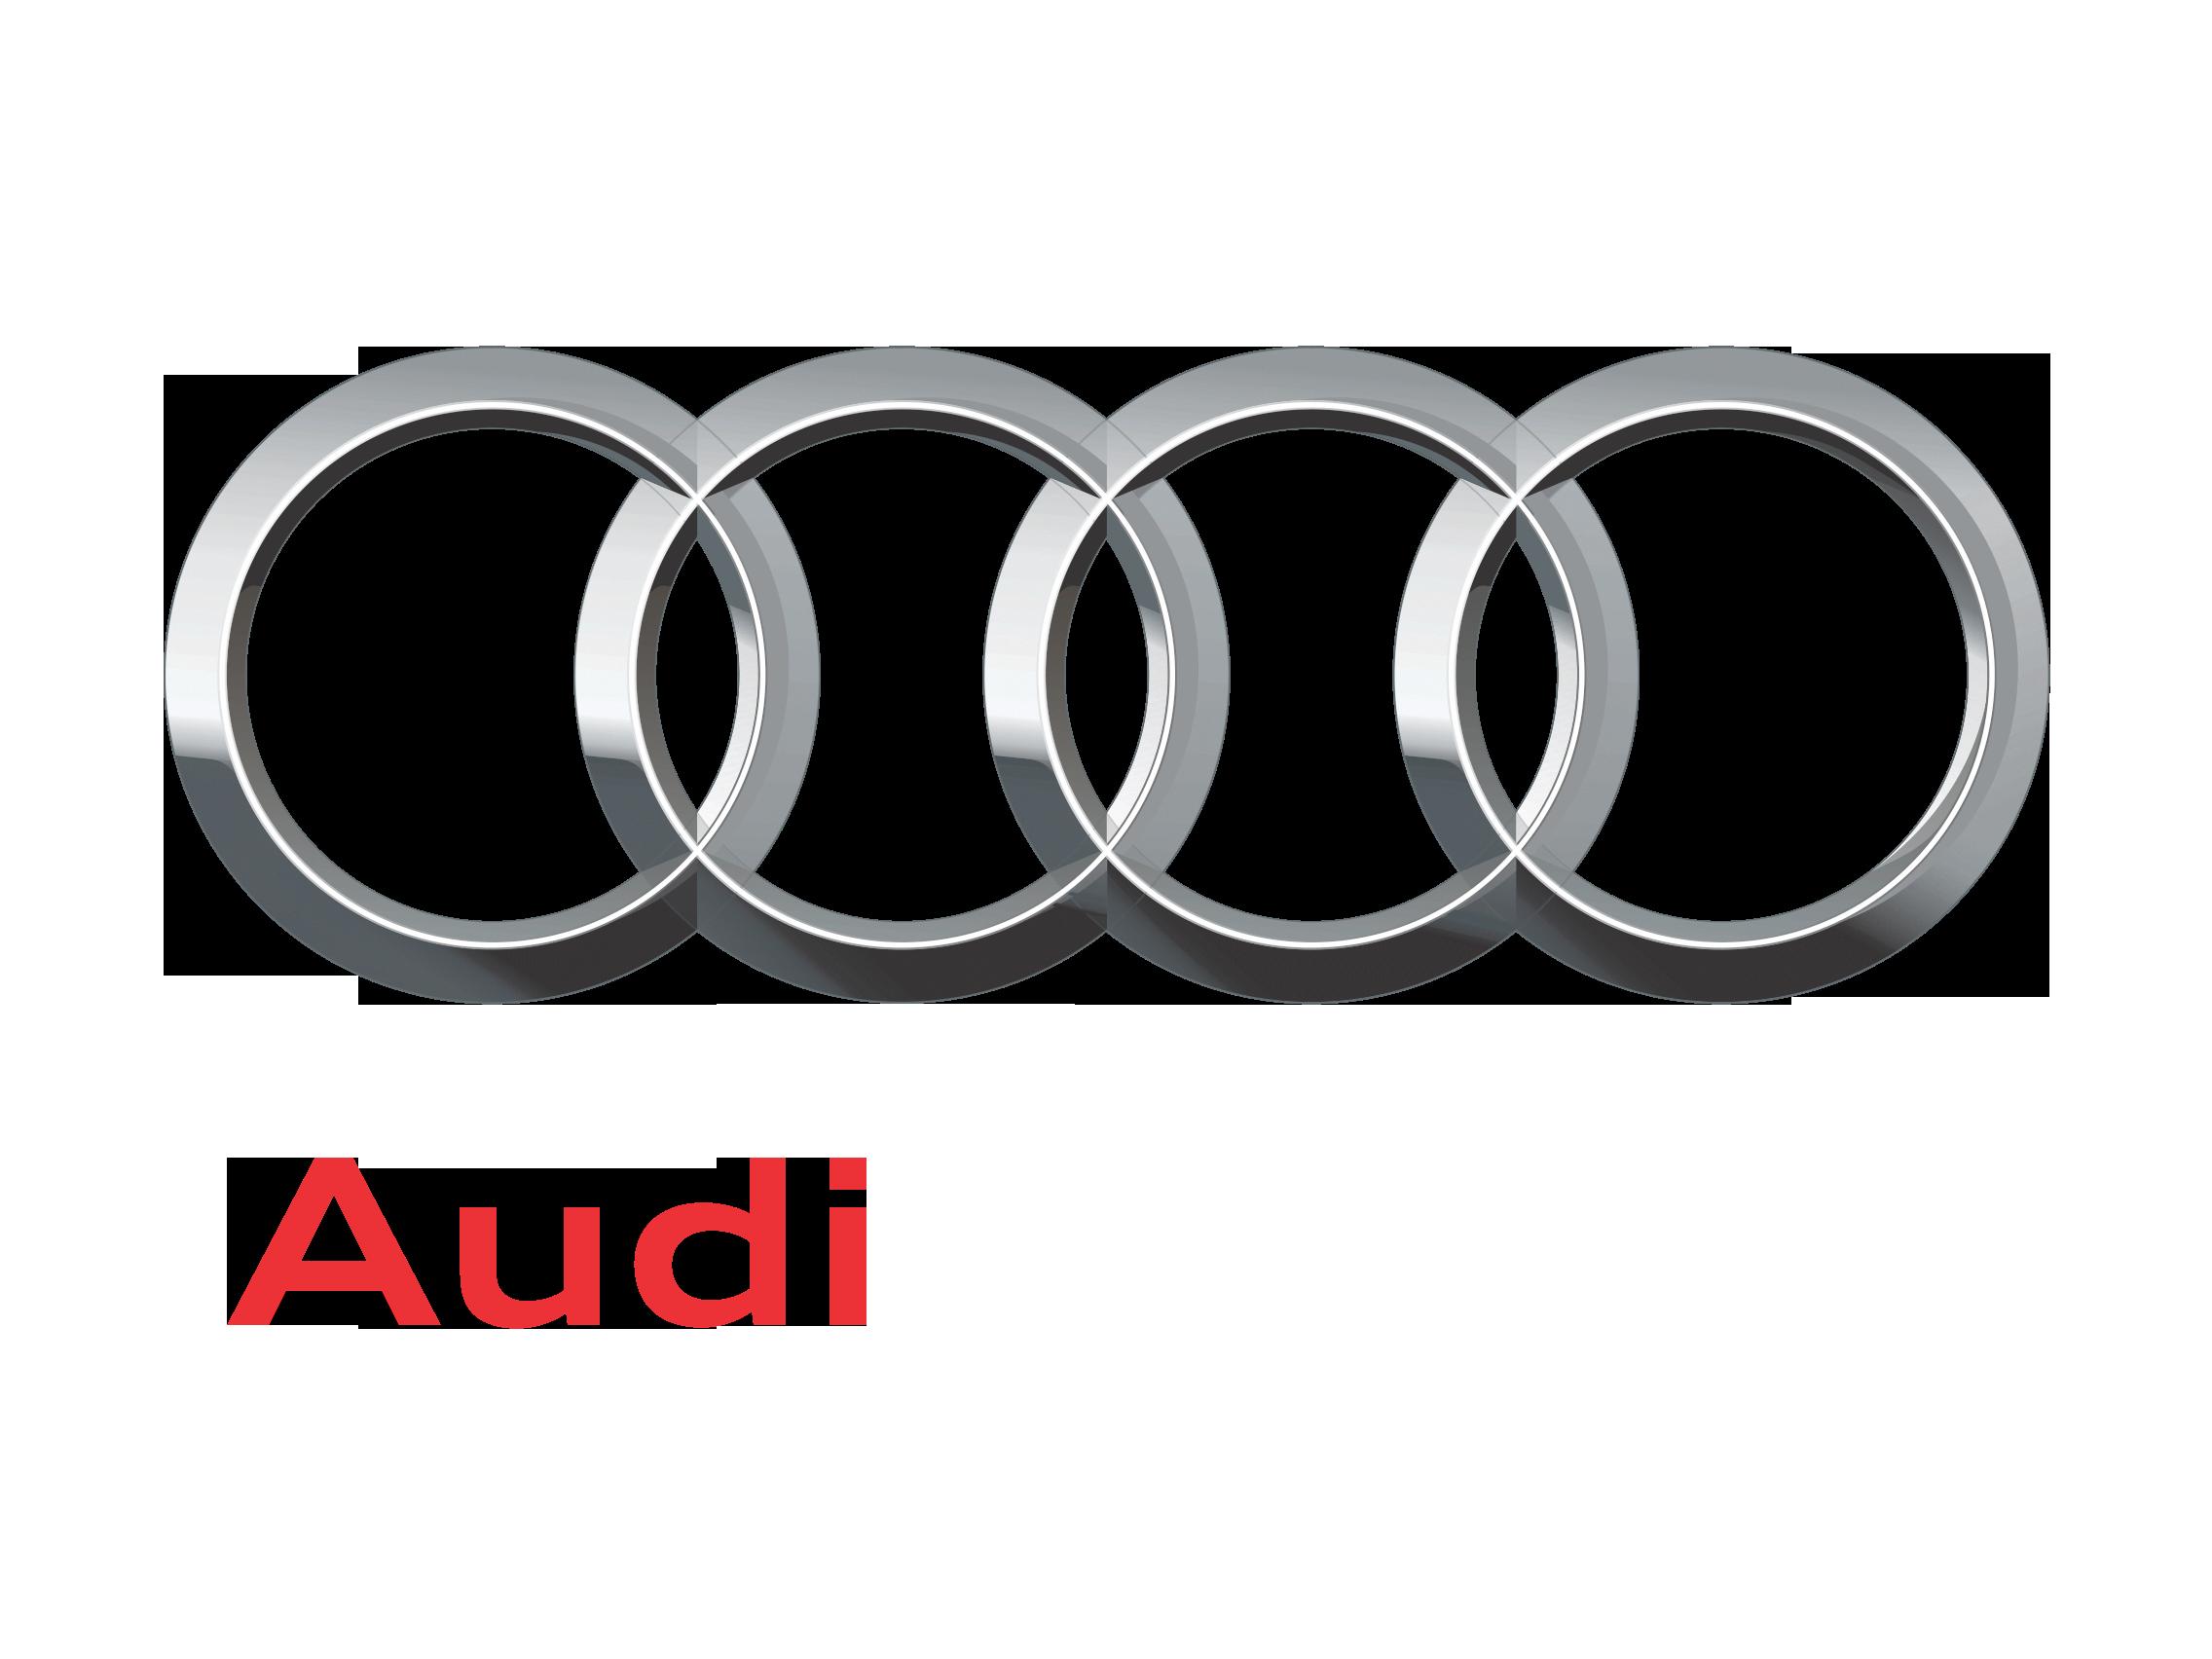 6 Audi Logo Vector Images